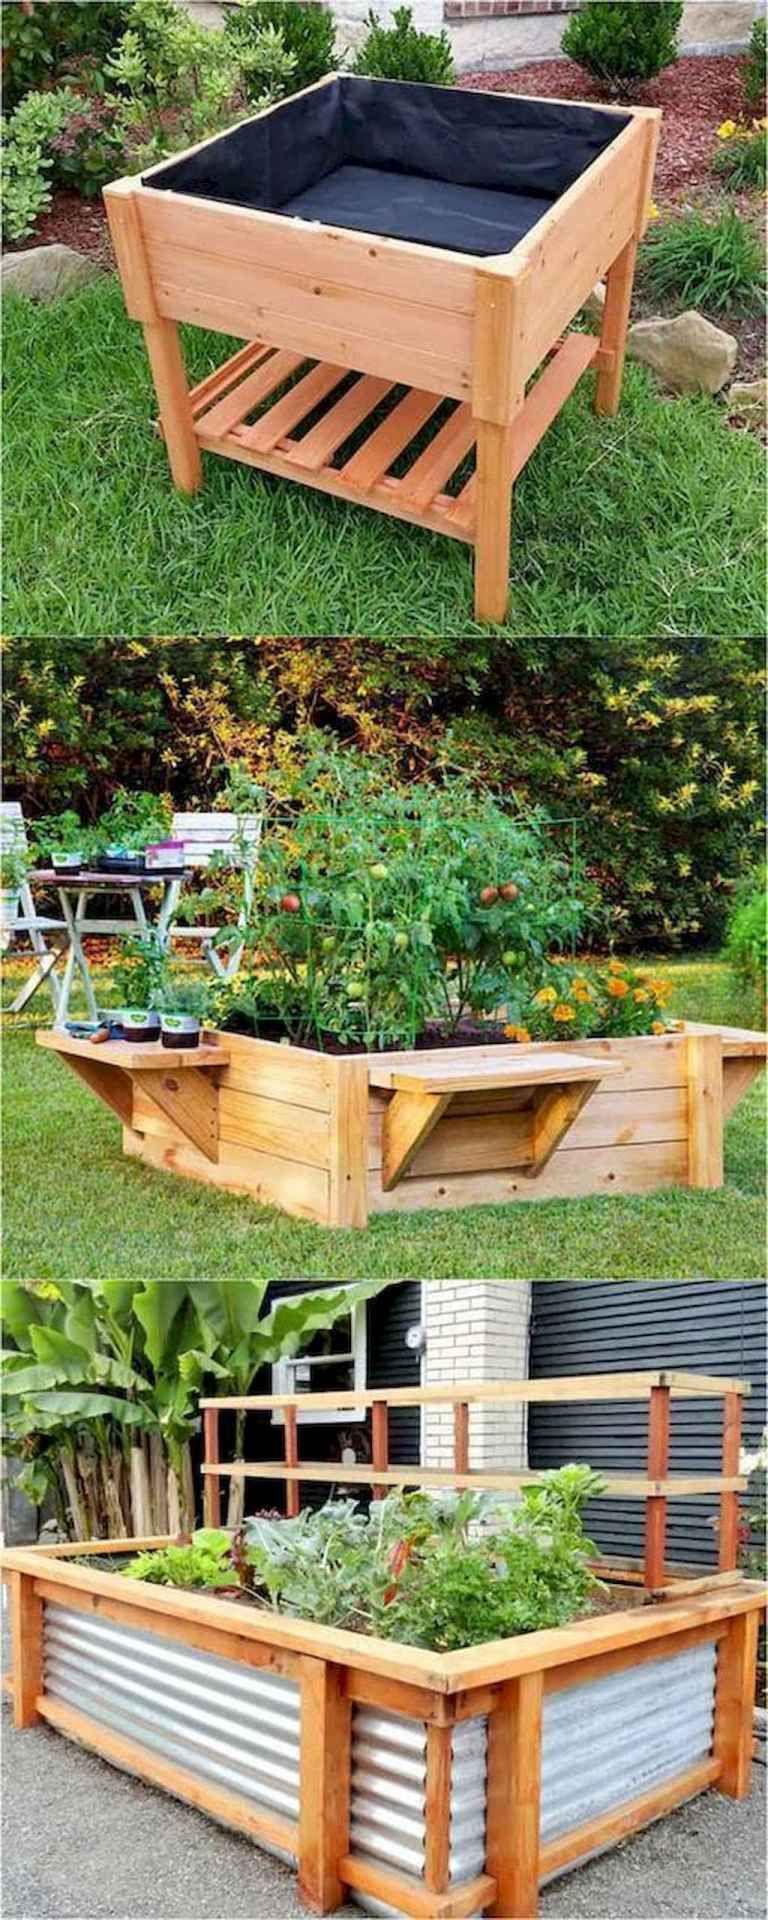 Simple Raised Vegetables Garden Bed Ideas 2019 07   Raised ...